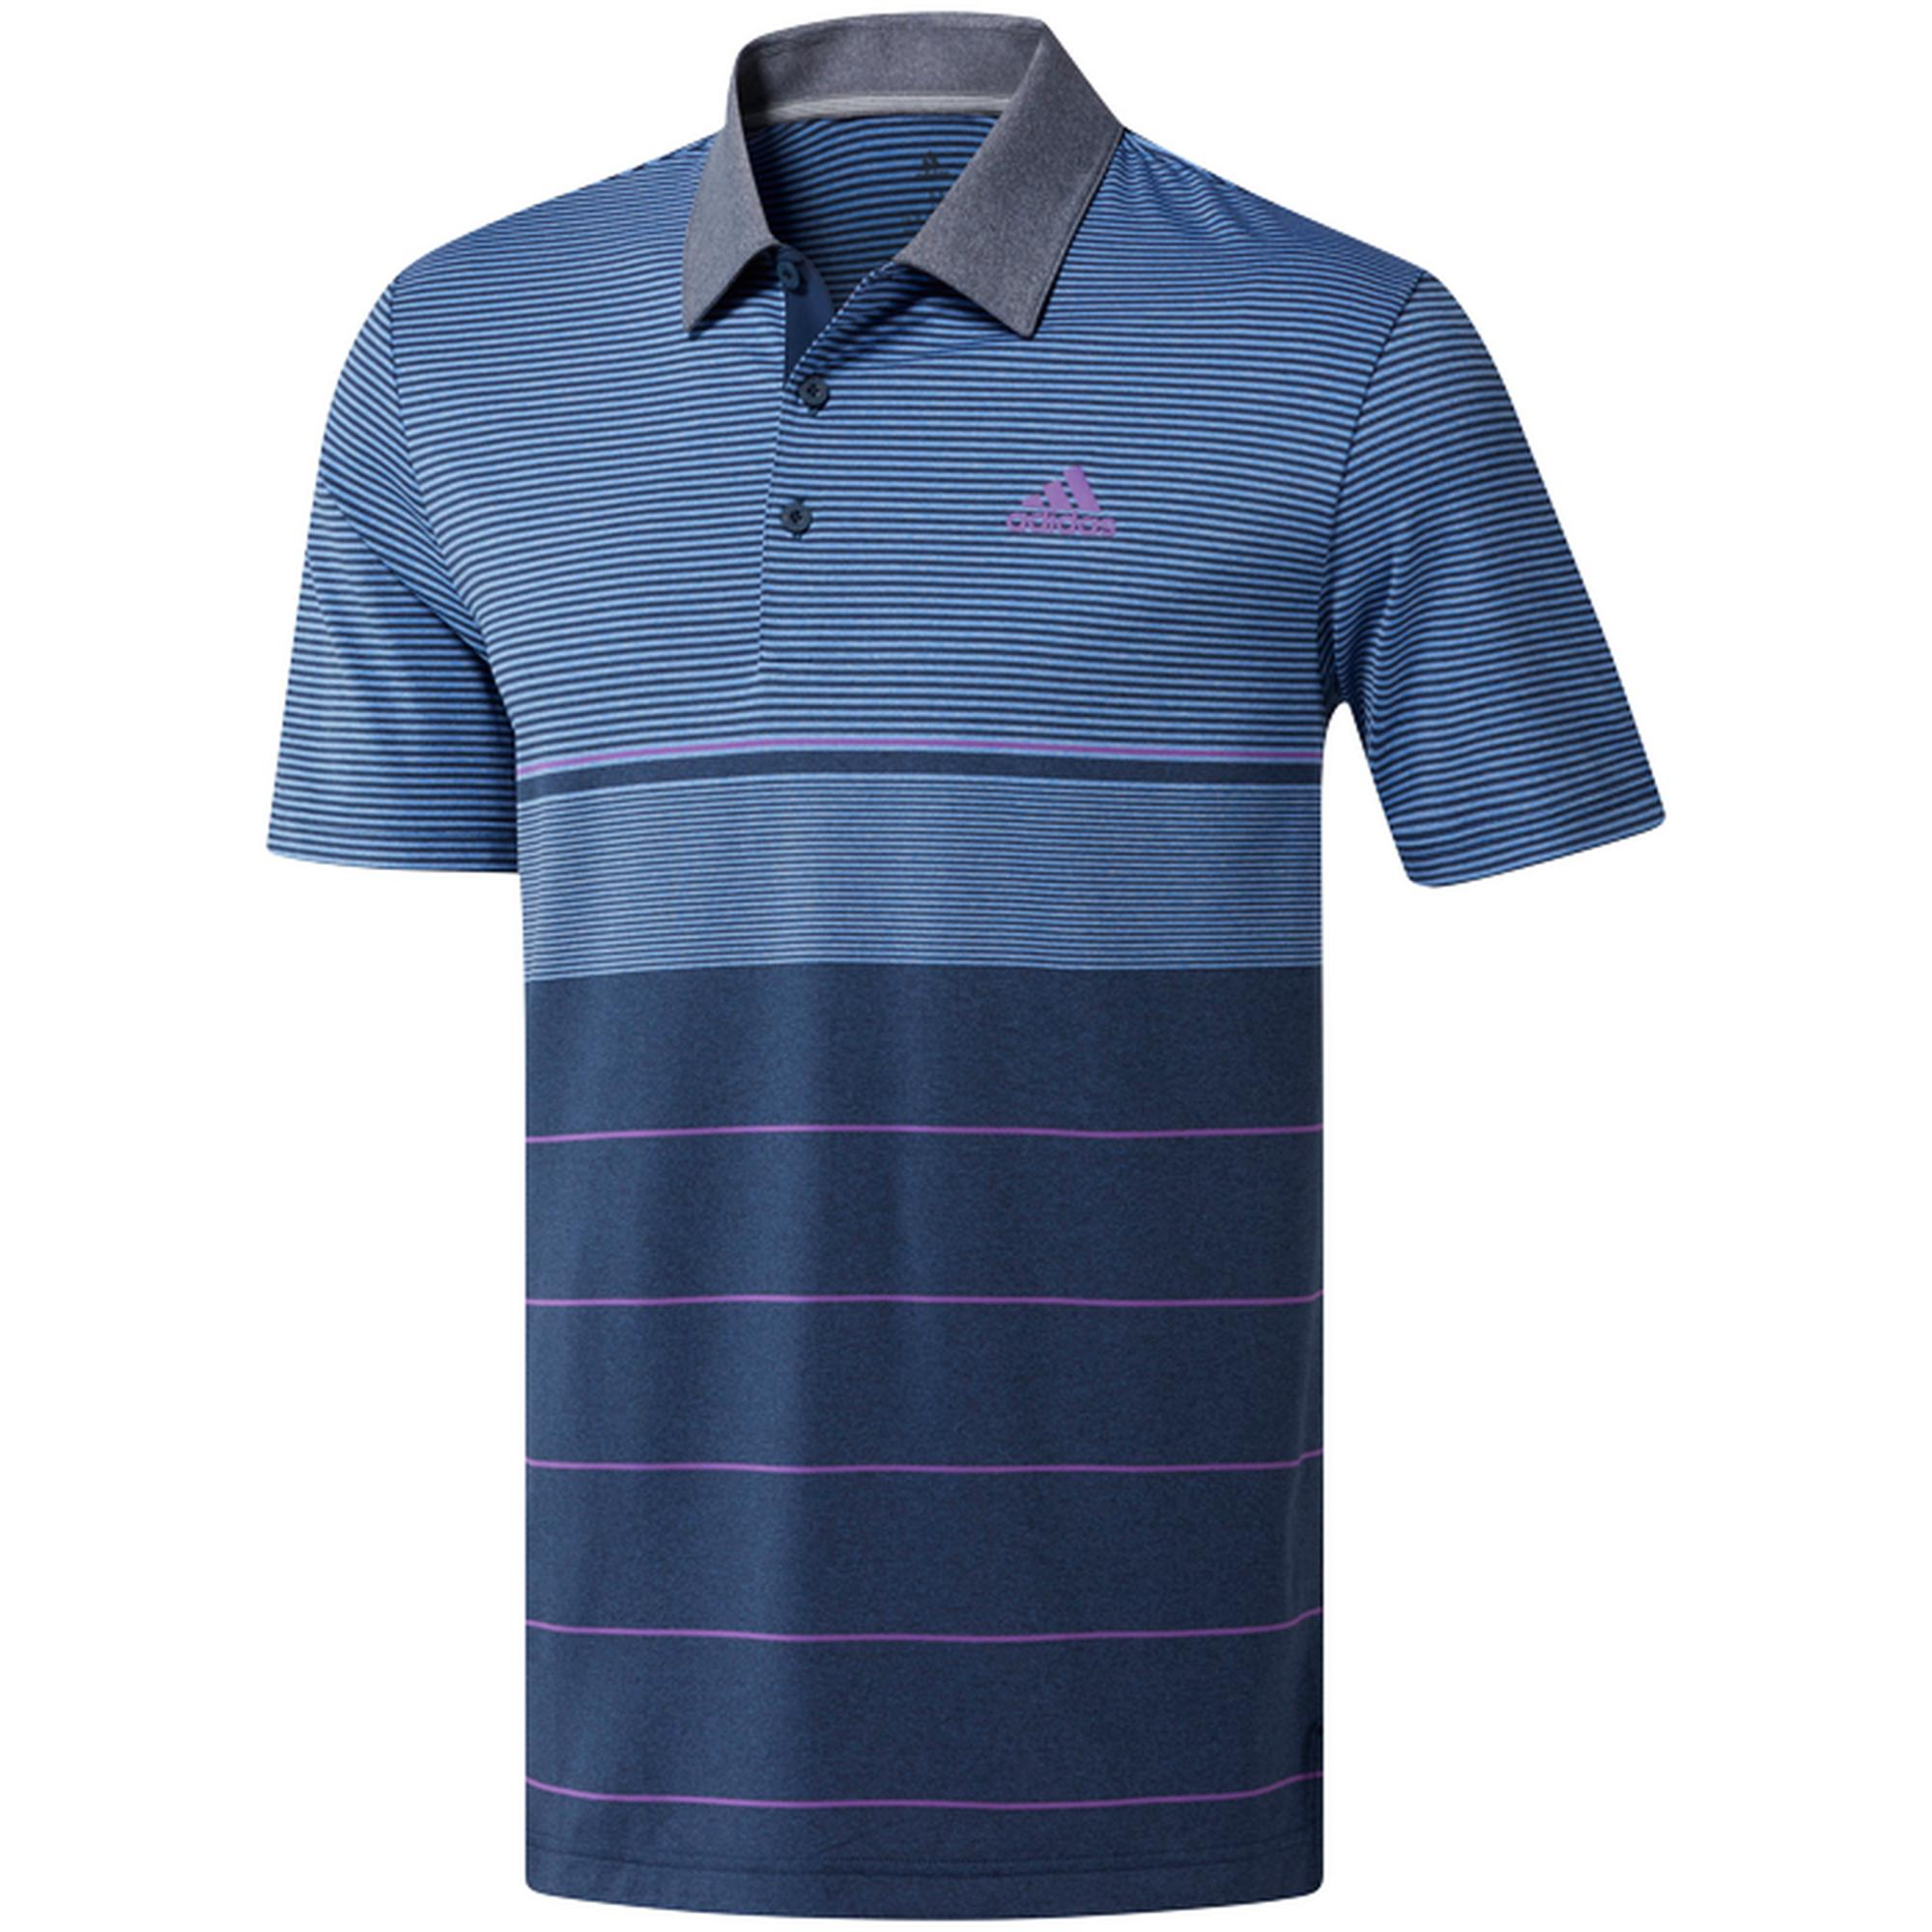 Men's Ultimate 365 Heather Stripe Short Sleeve Shirt